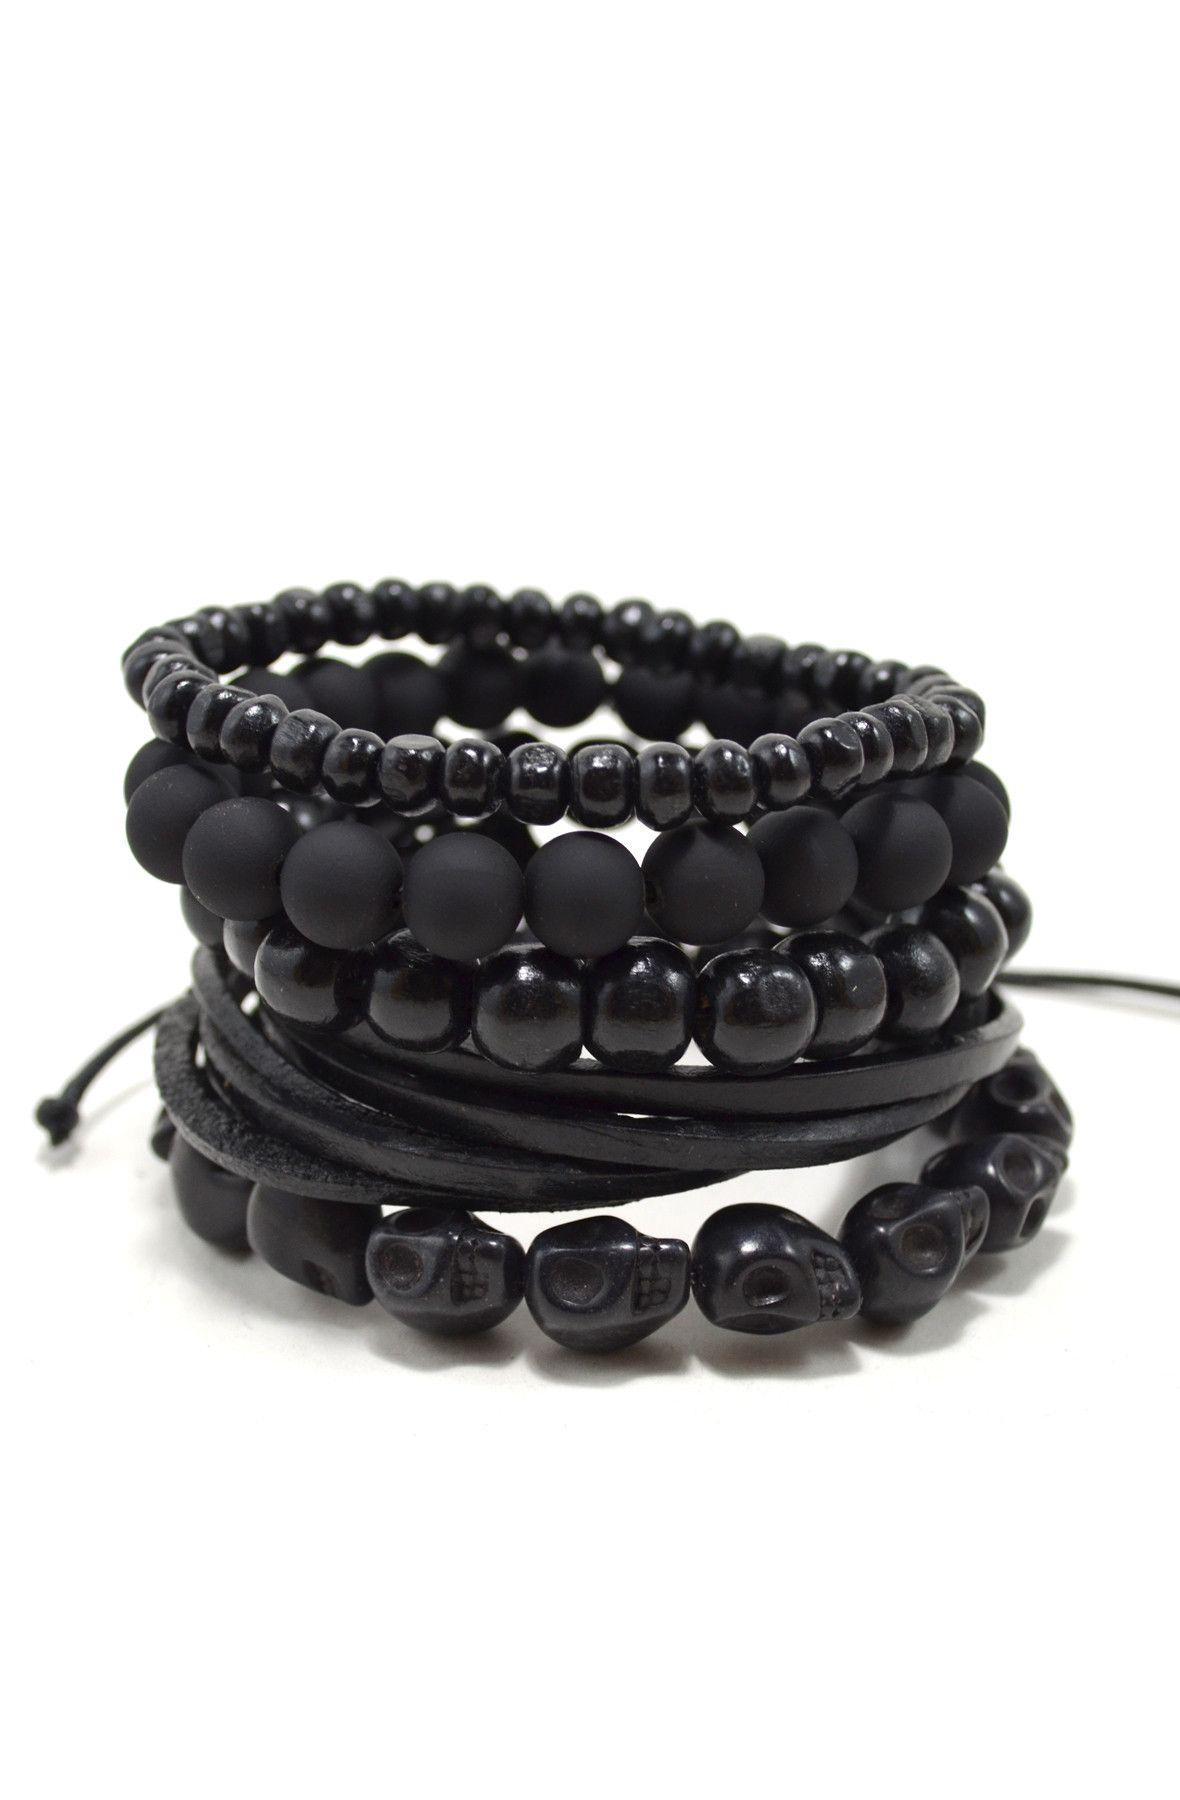 6dd1b4dcd1130 5 Pack Black Out Bracelet | Tag Twenty Two Bracelets | Mens fashion ...